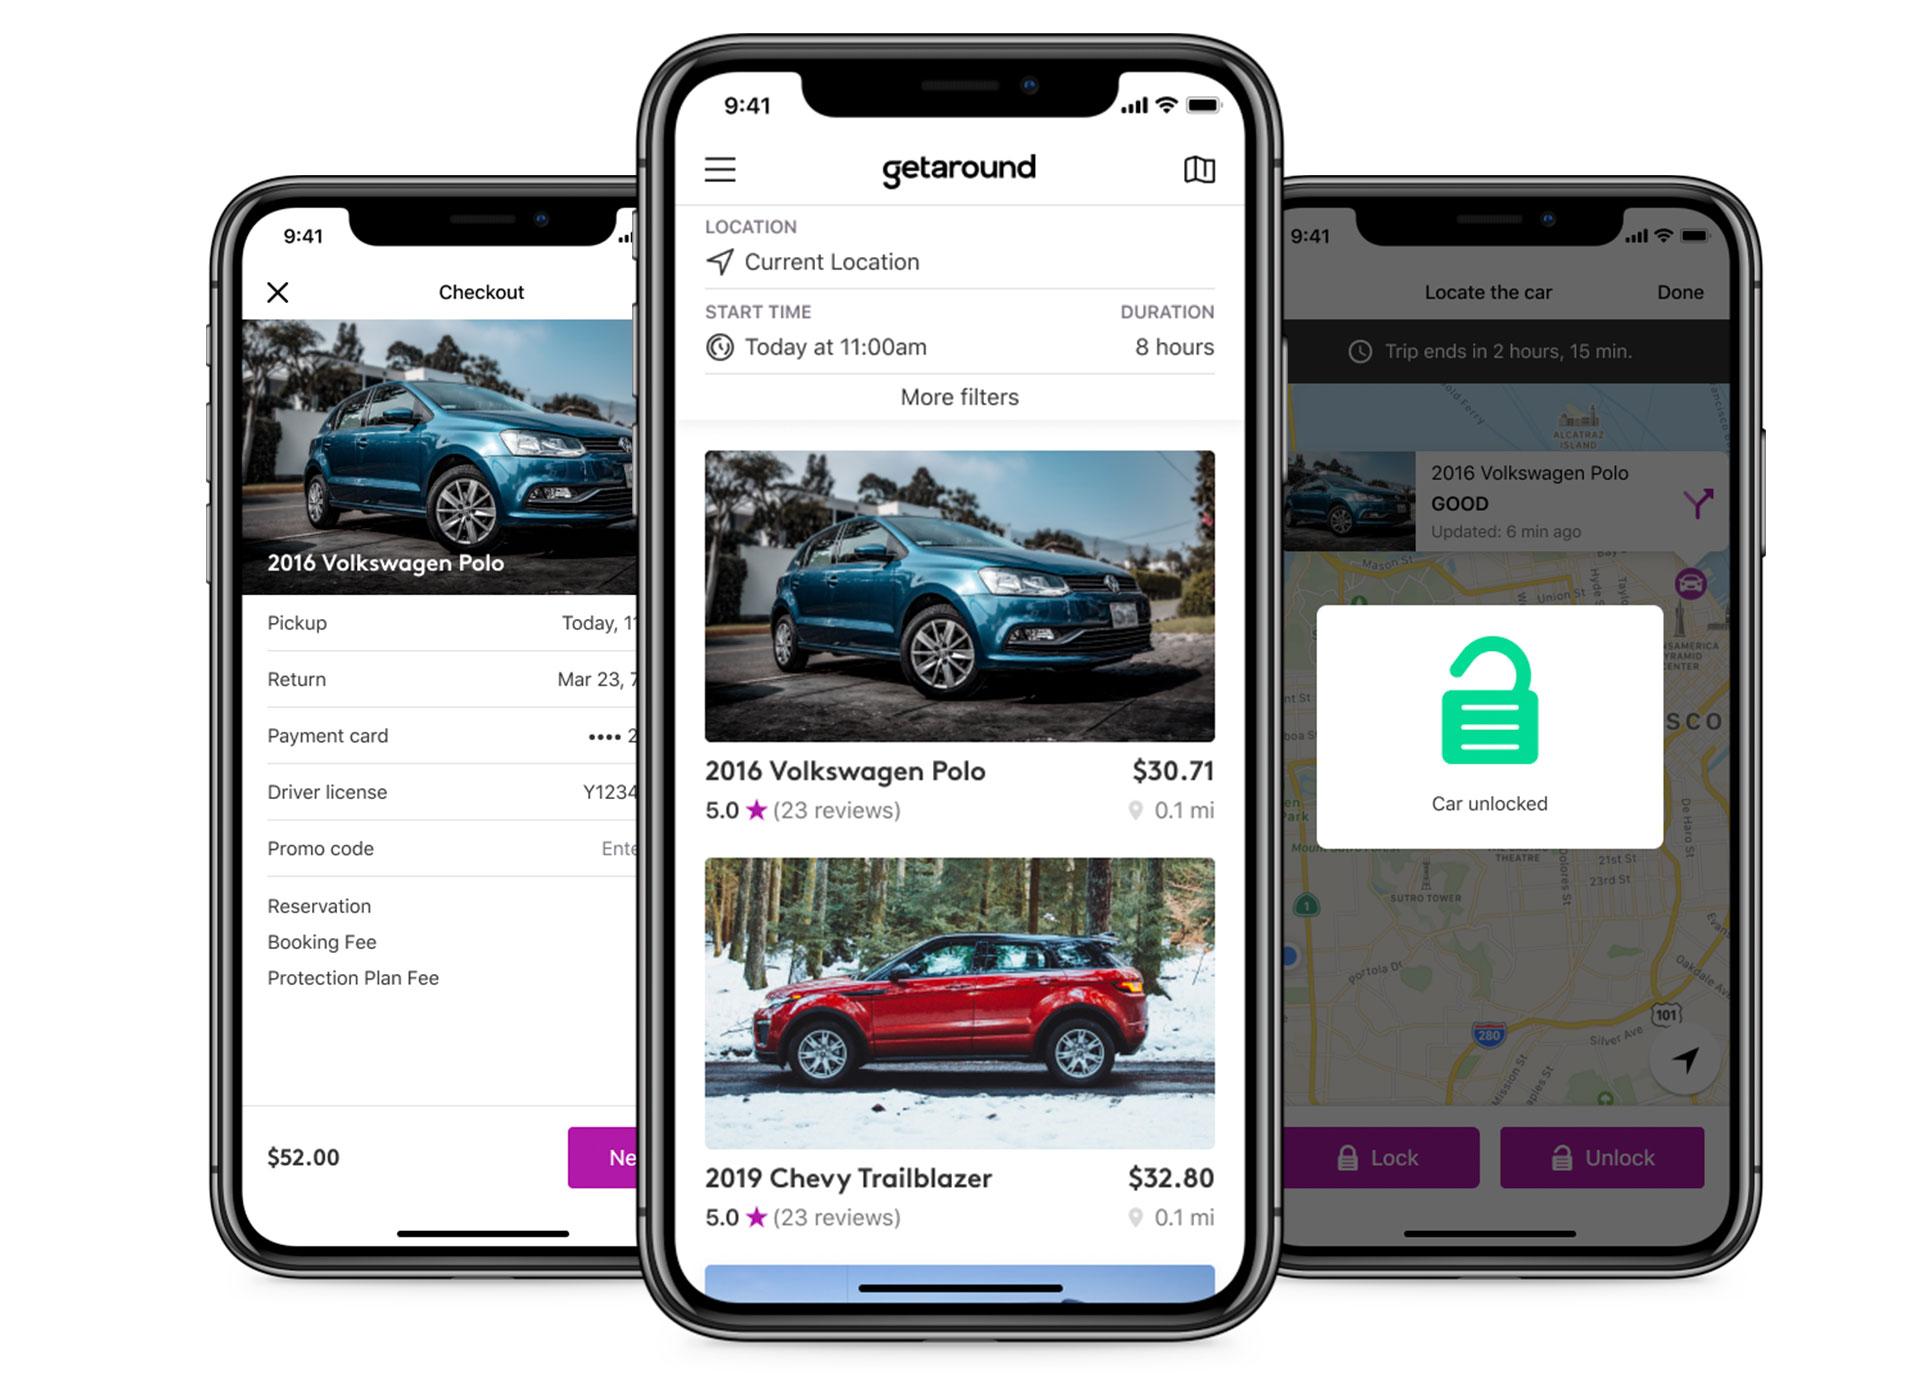 Find, book, and unlock car on Getaround®